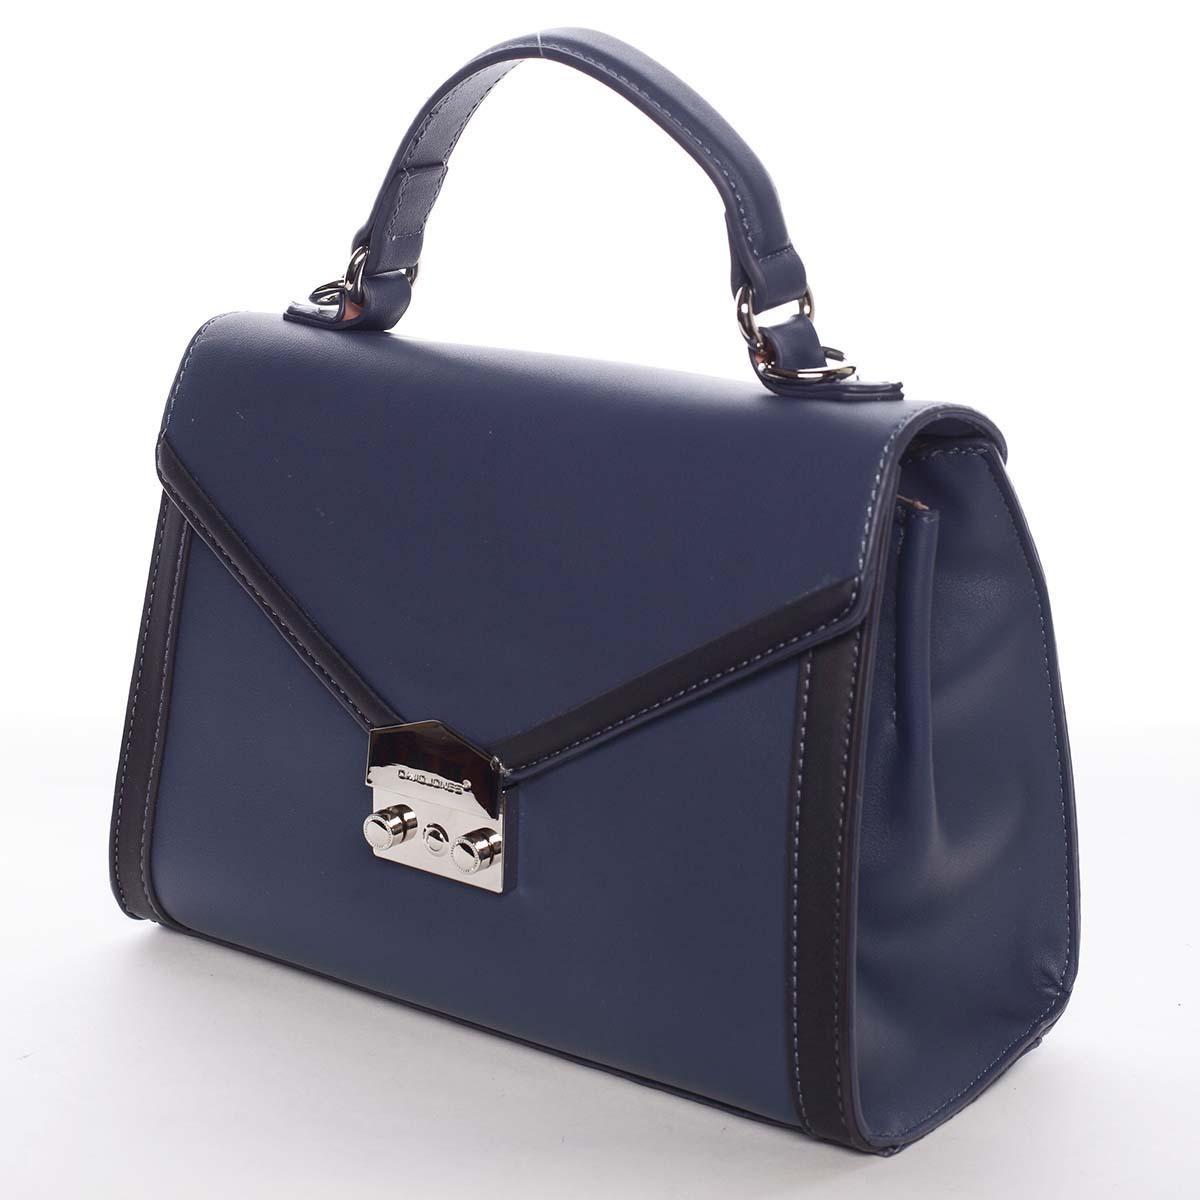 Exkluzívna menšia dámska kabelka do ruky tmavomodrá - David Jones Mayumi